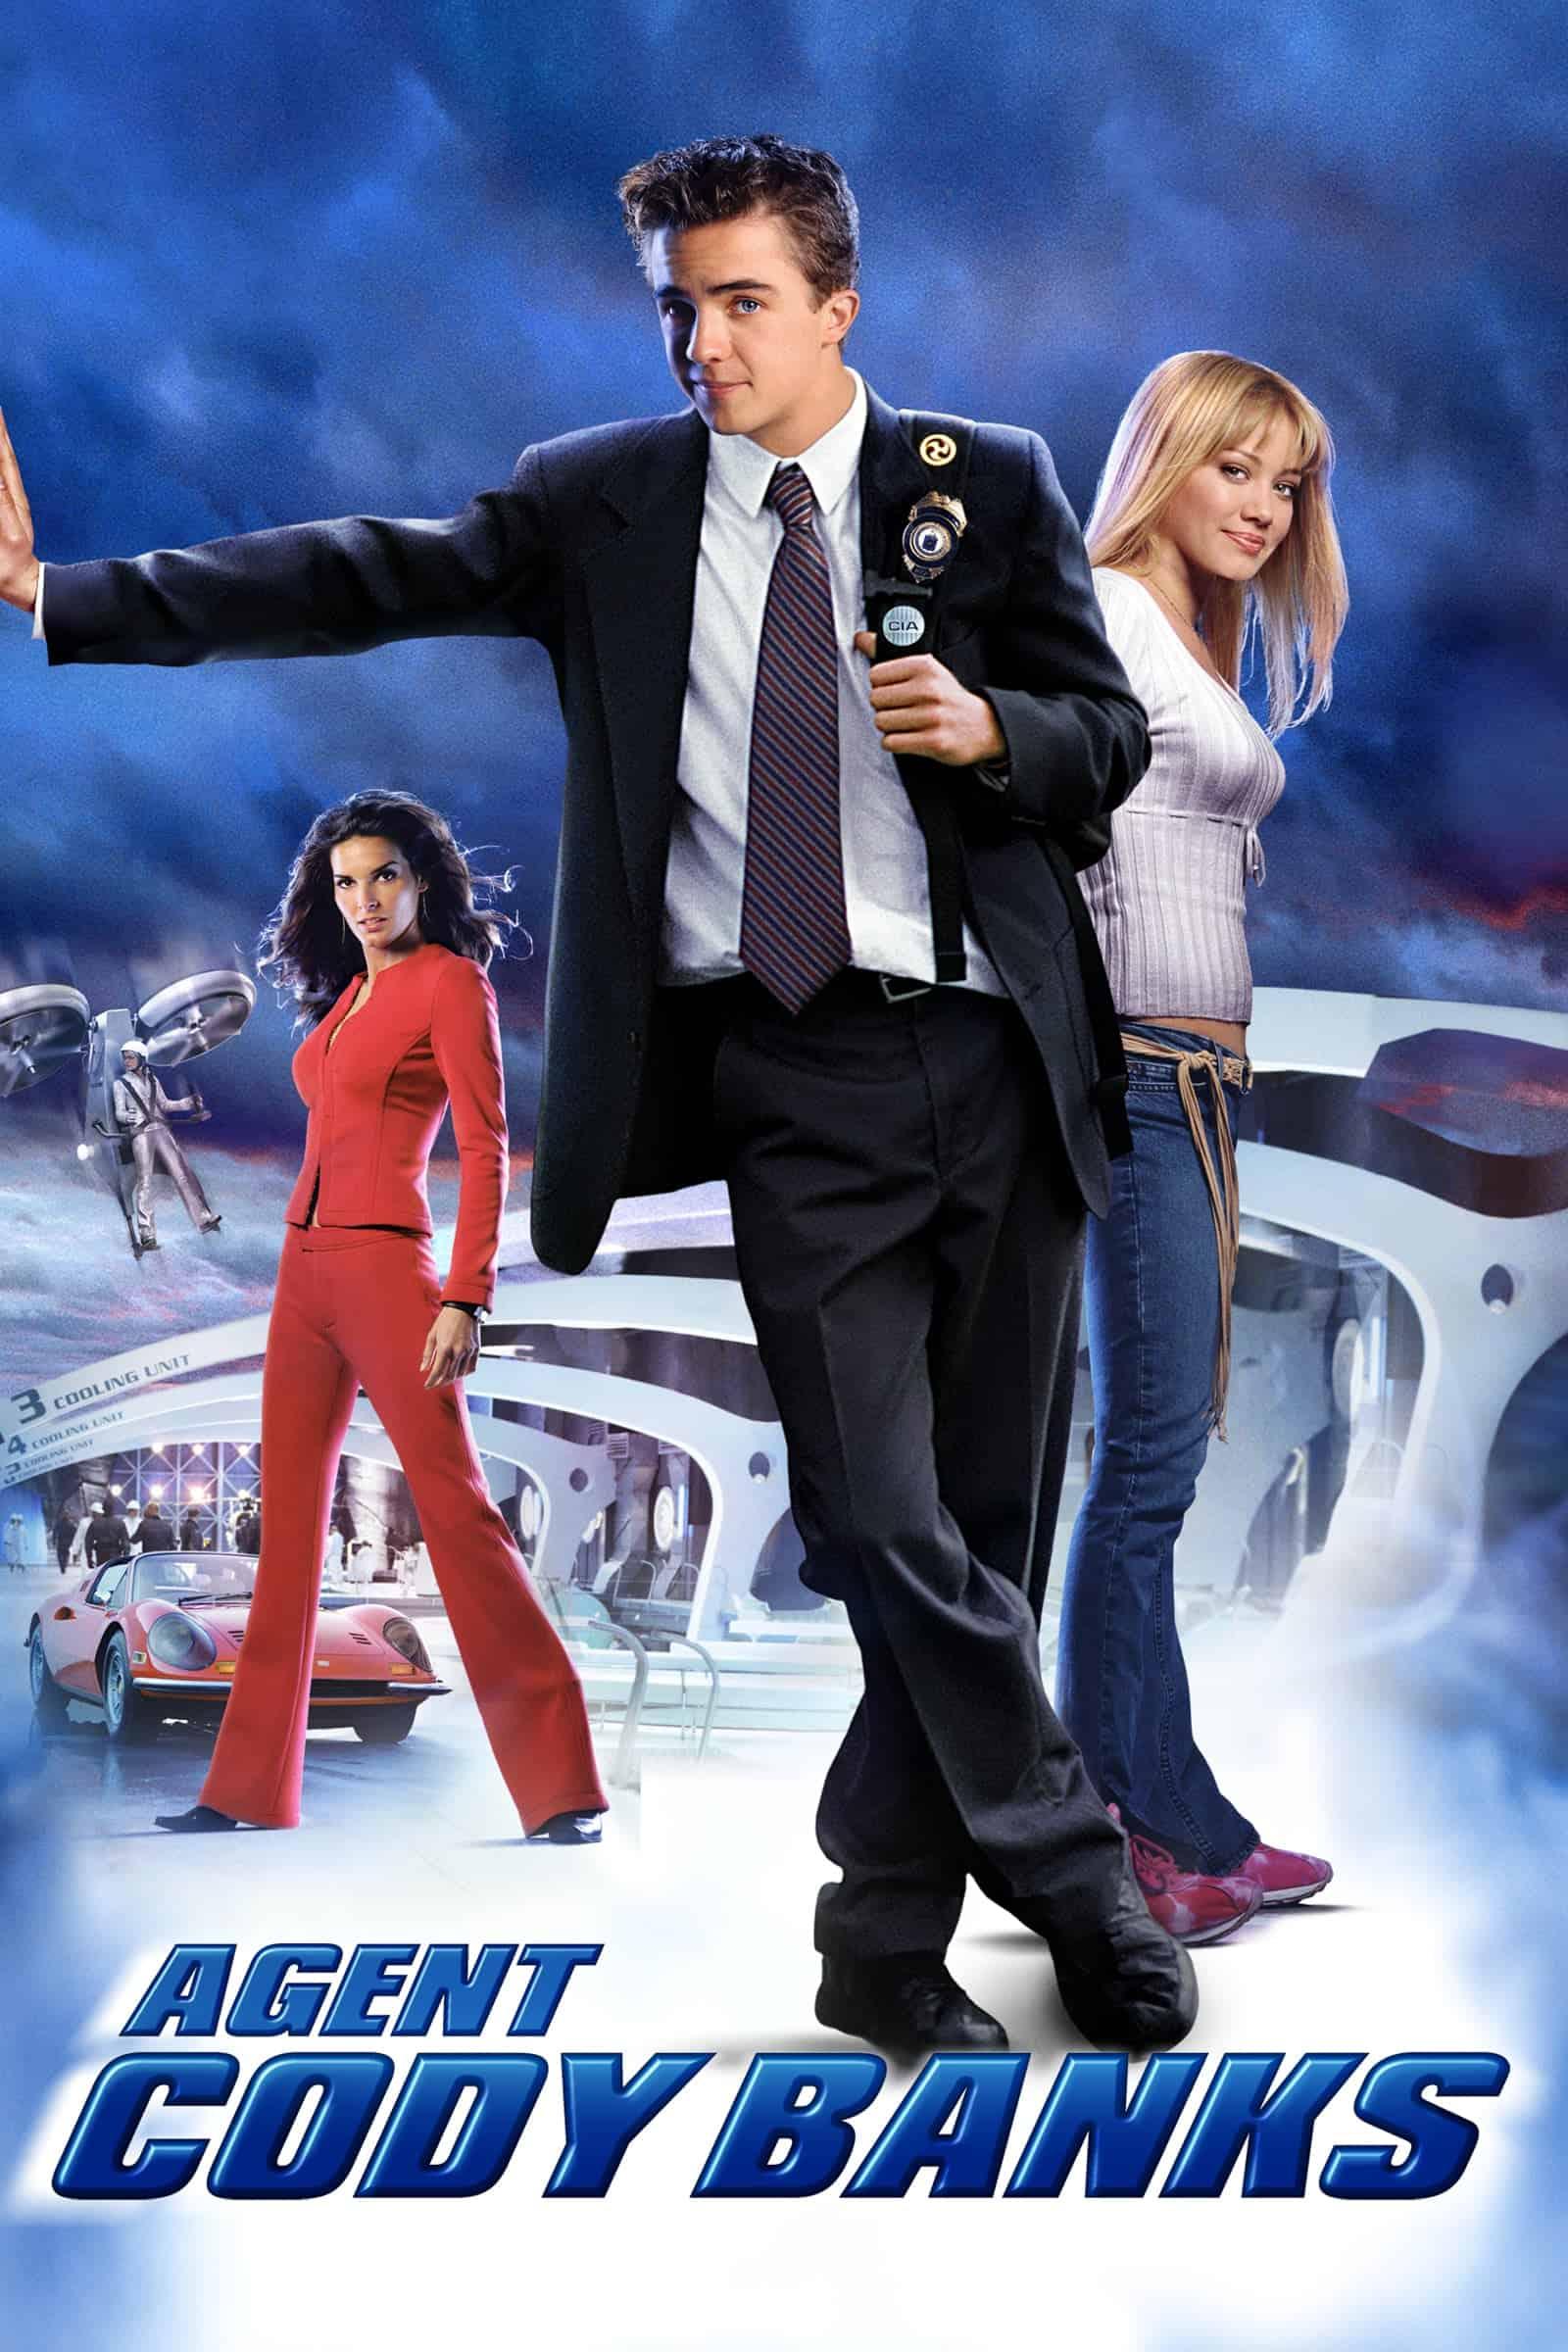 Agent Cody Banks, 2003